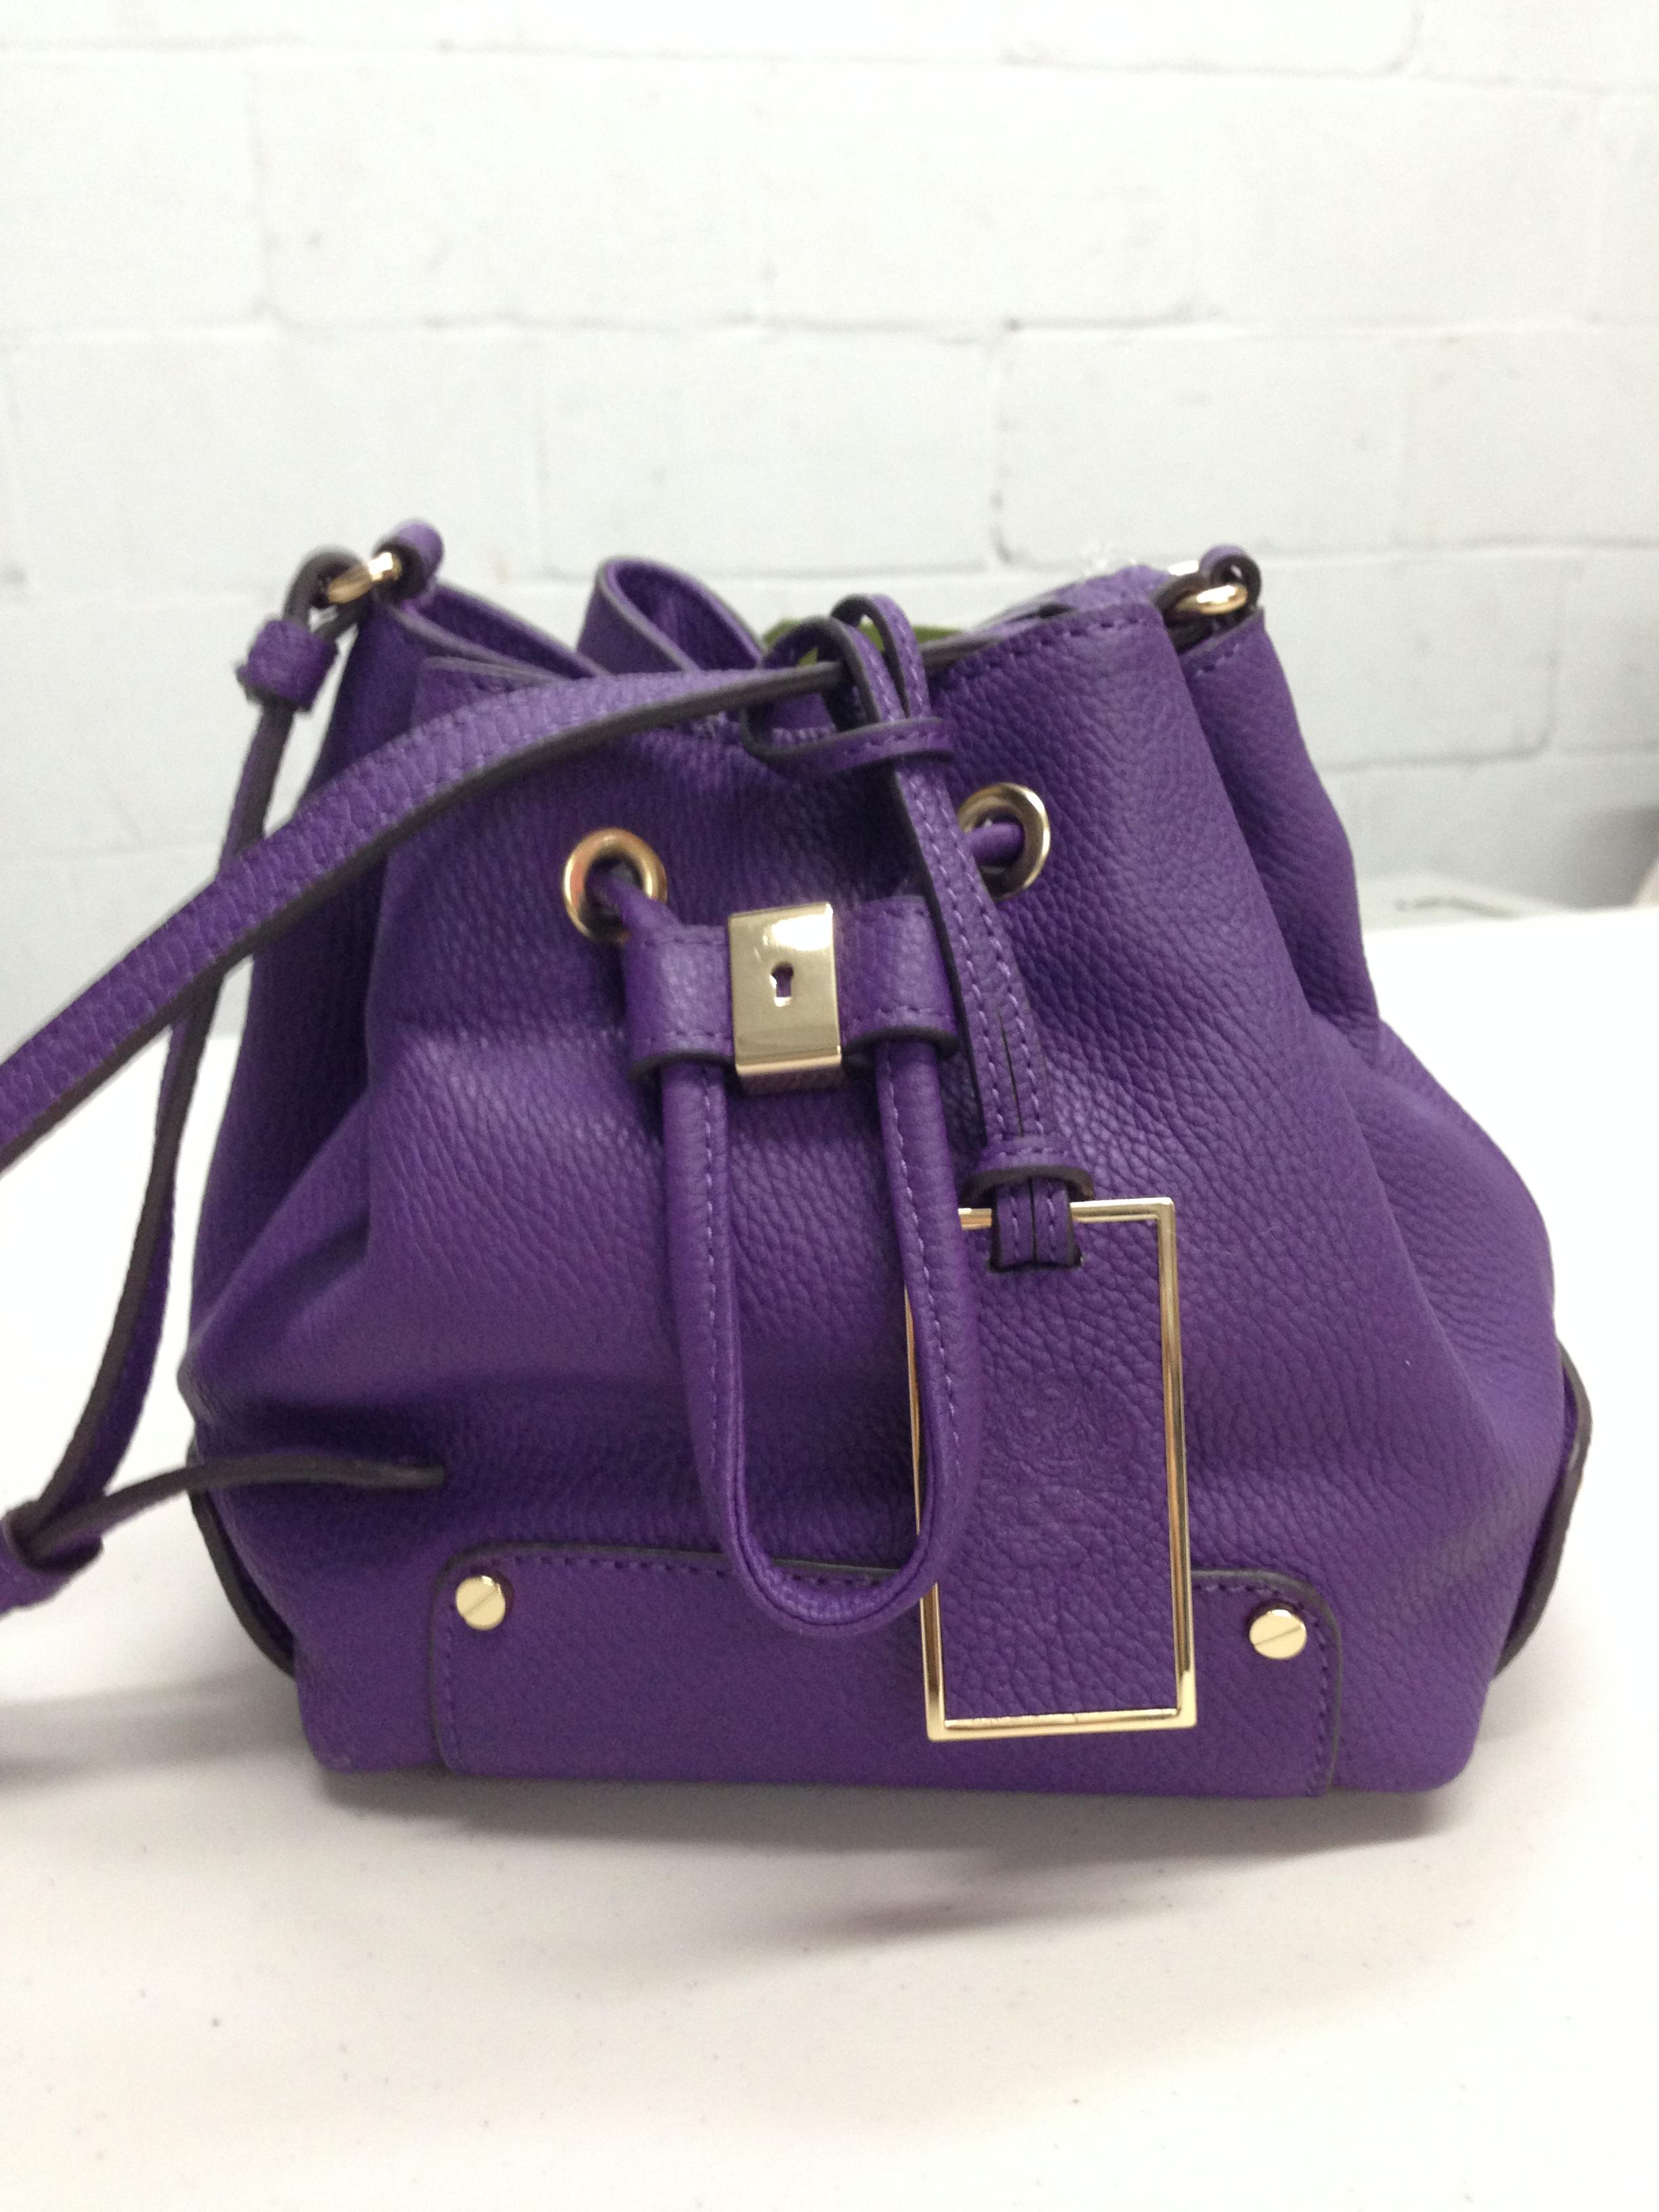 tignanello handbags on sale